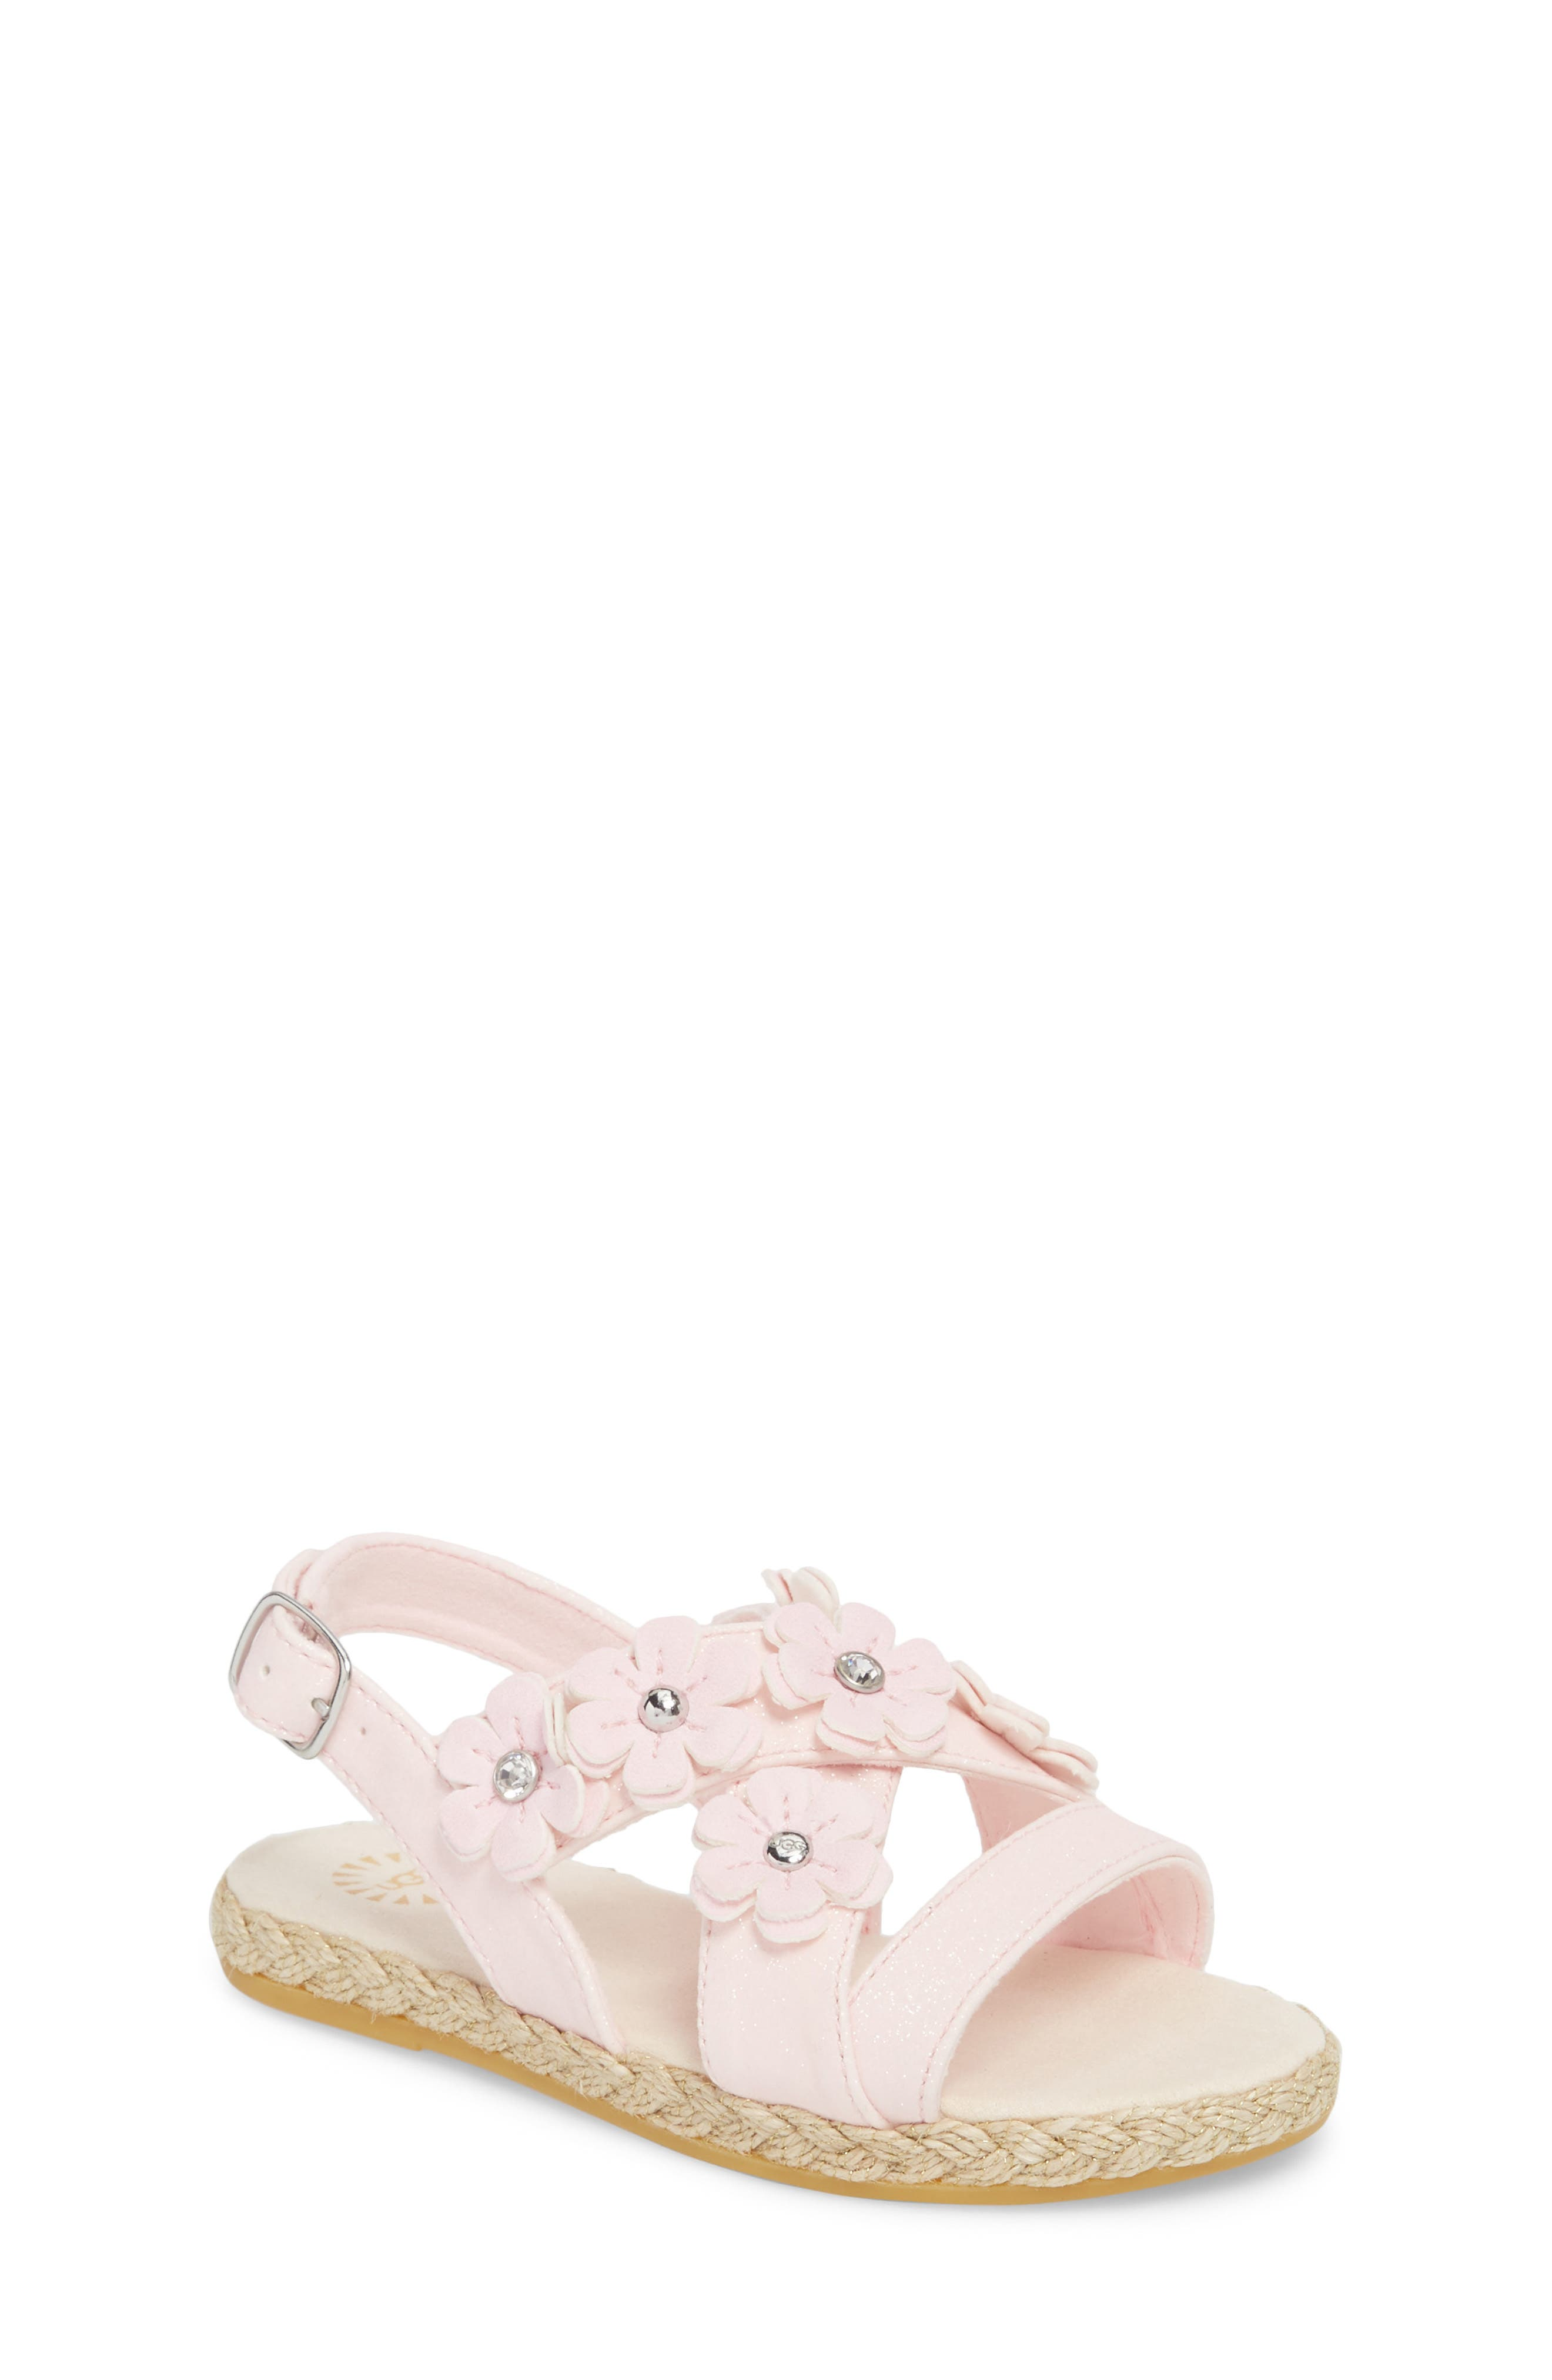 UGG<SUP>®</SUP> Allairey Sparkles Espadrille Sandal, Main, color, SEASHELL PINK